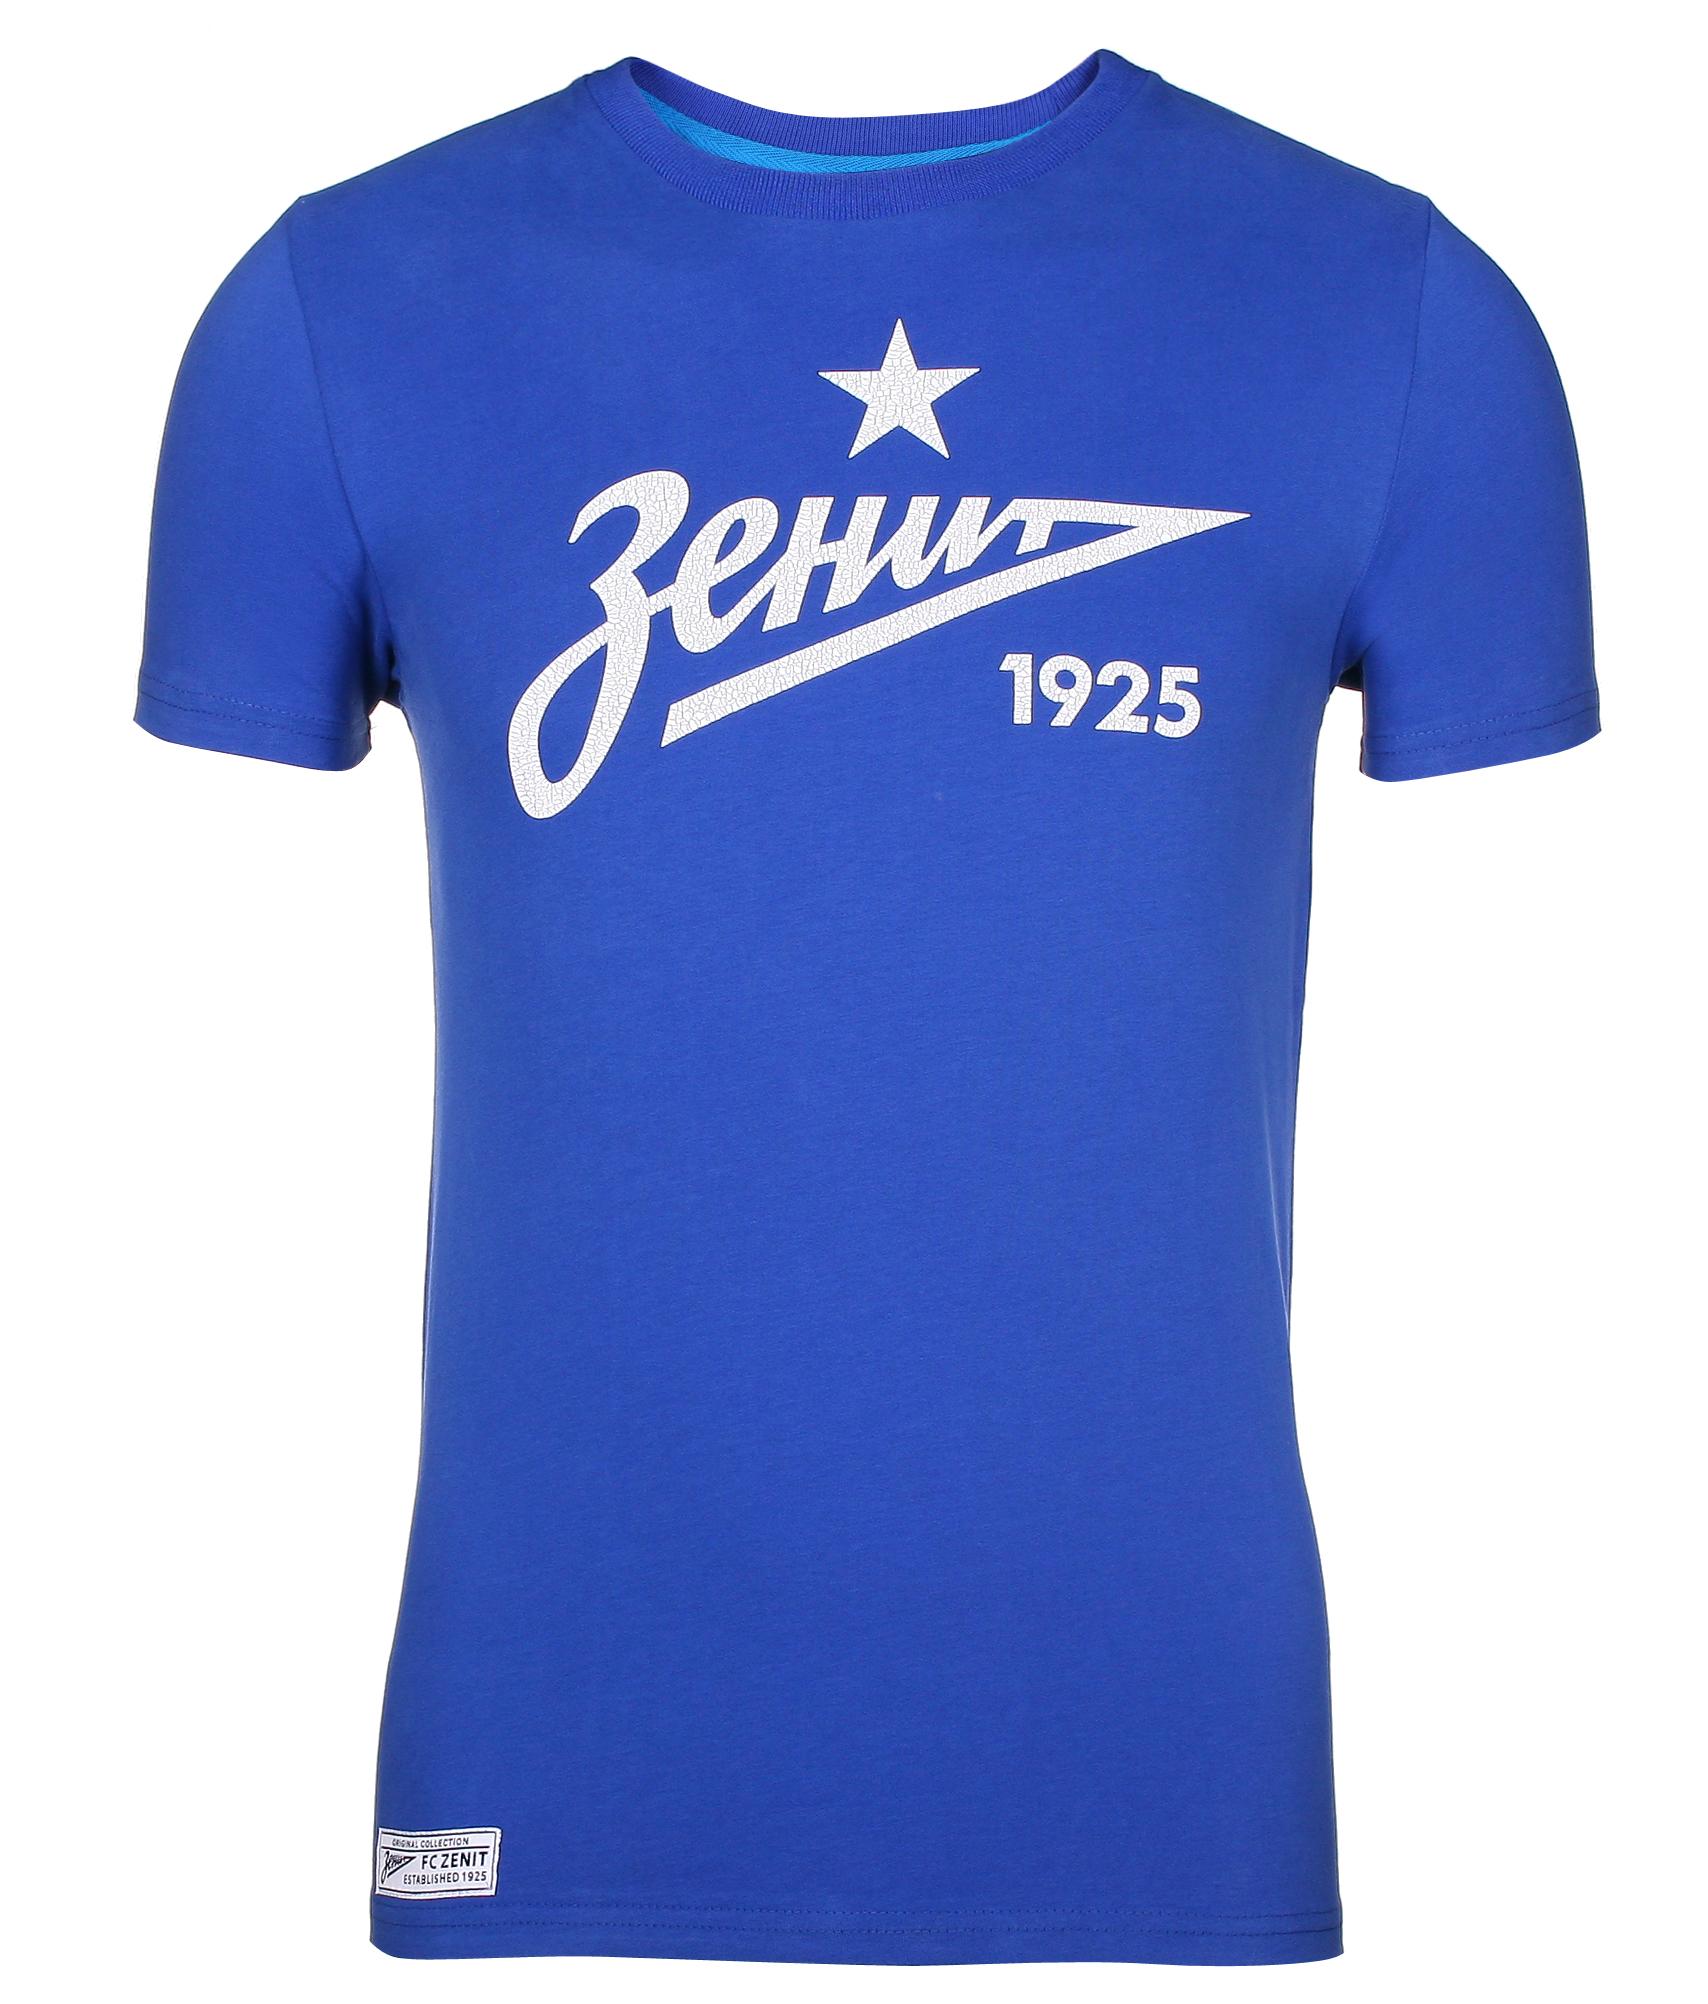 Футболка мужская, Цвет-Синий, Размер-S